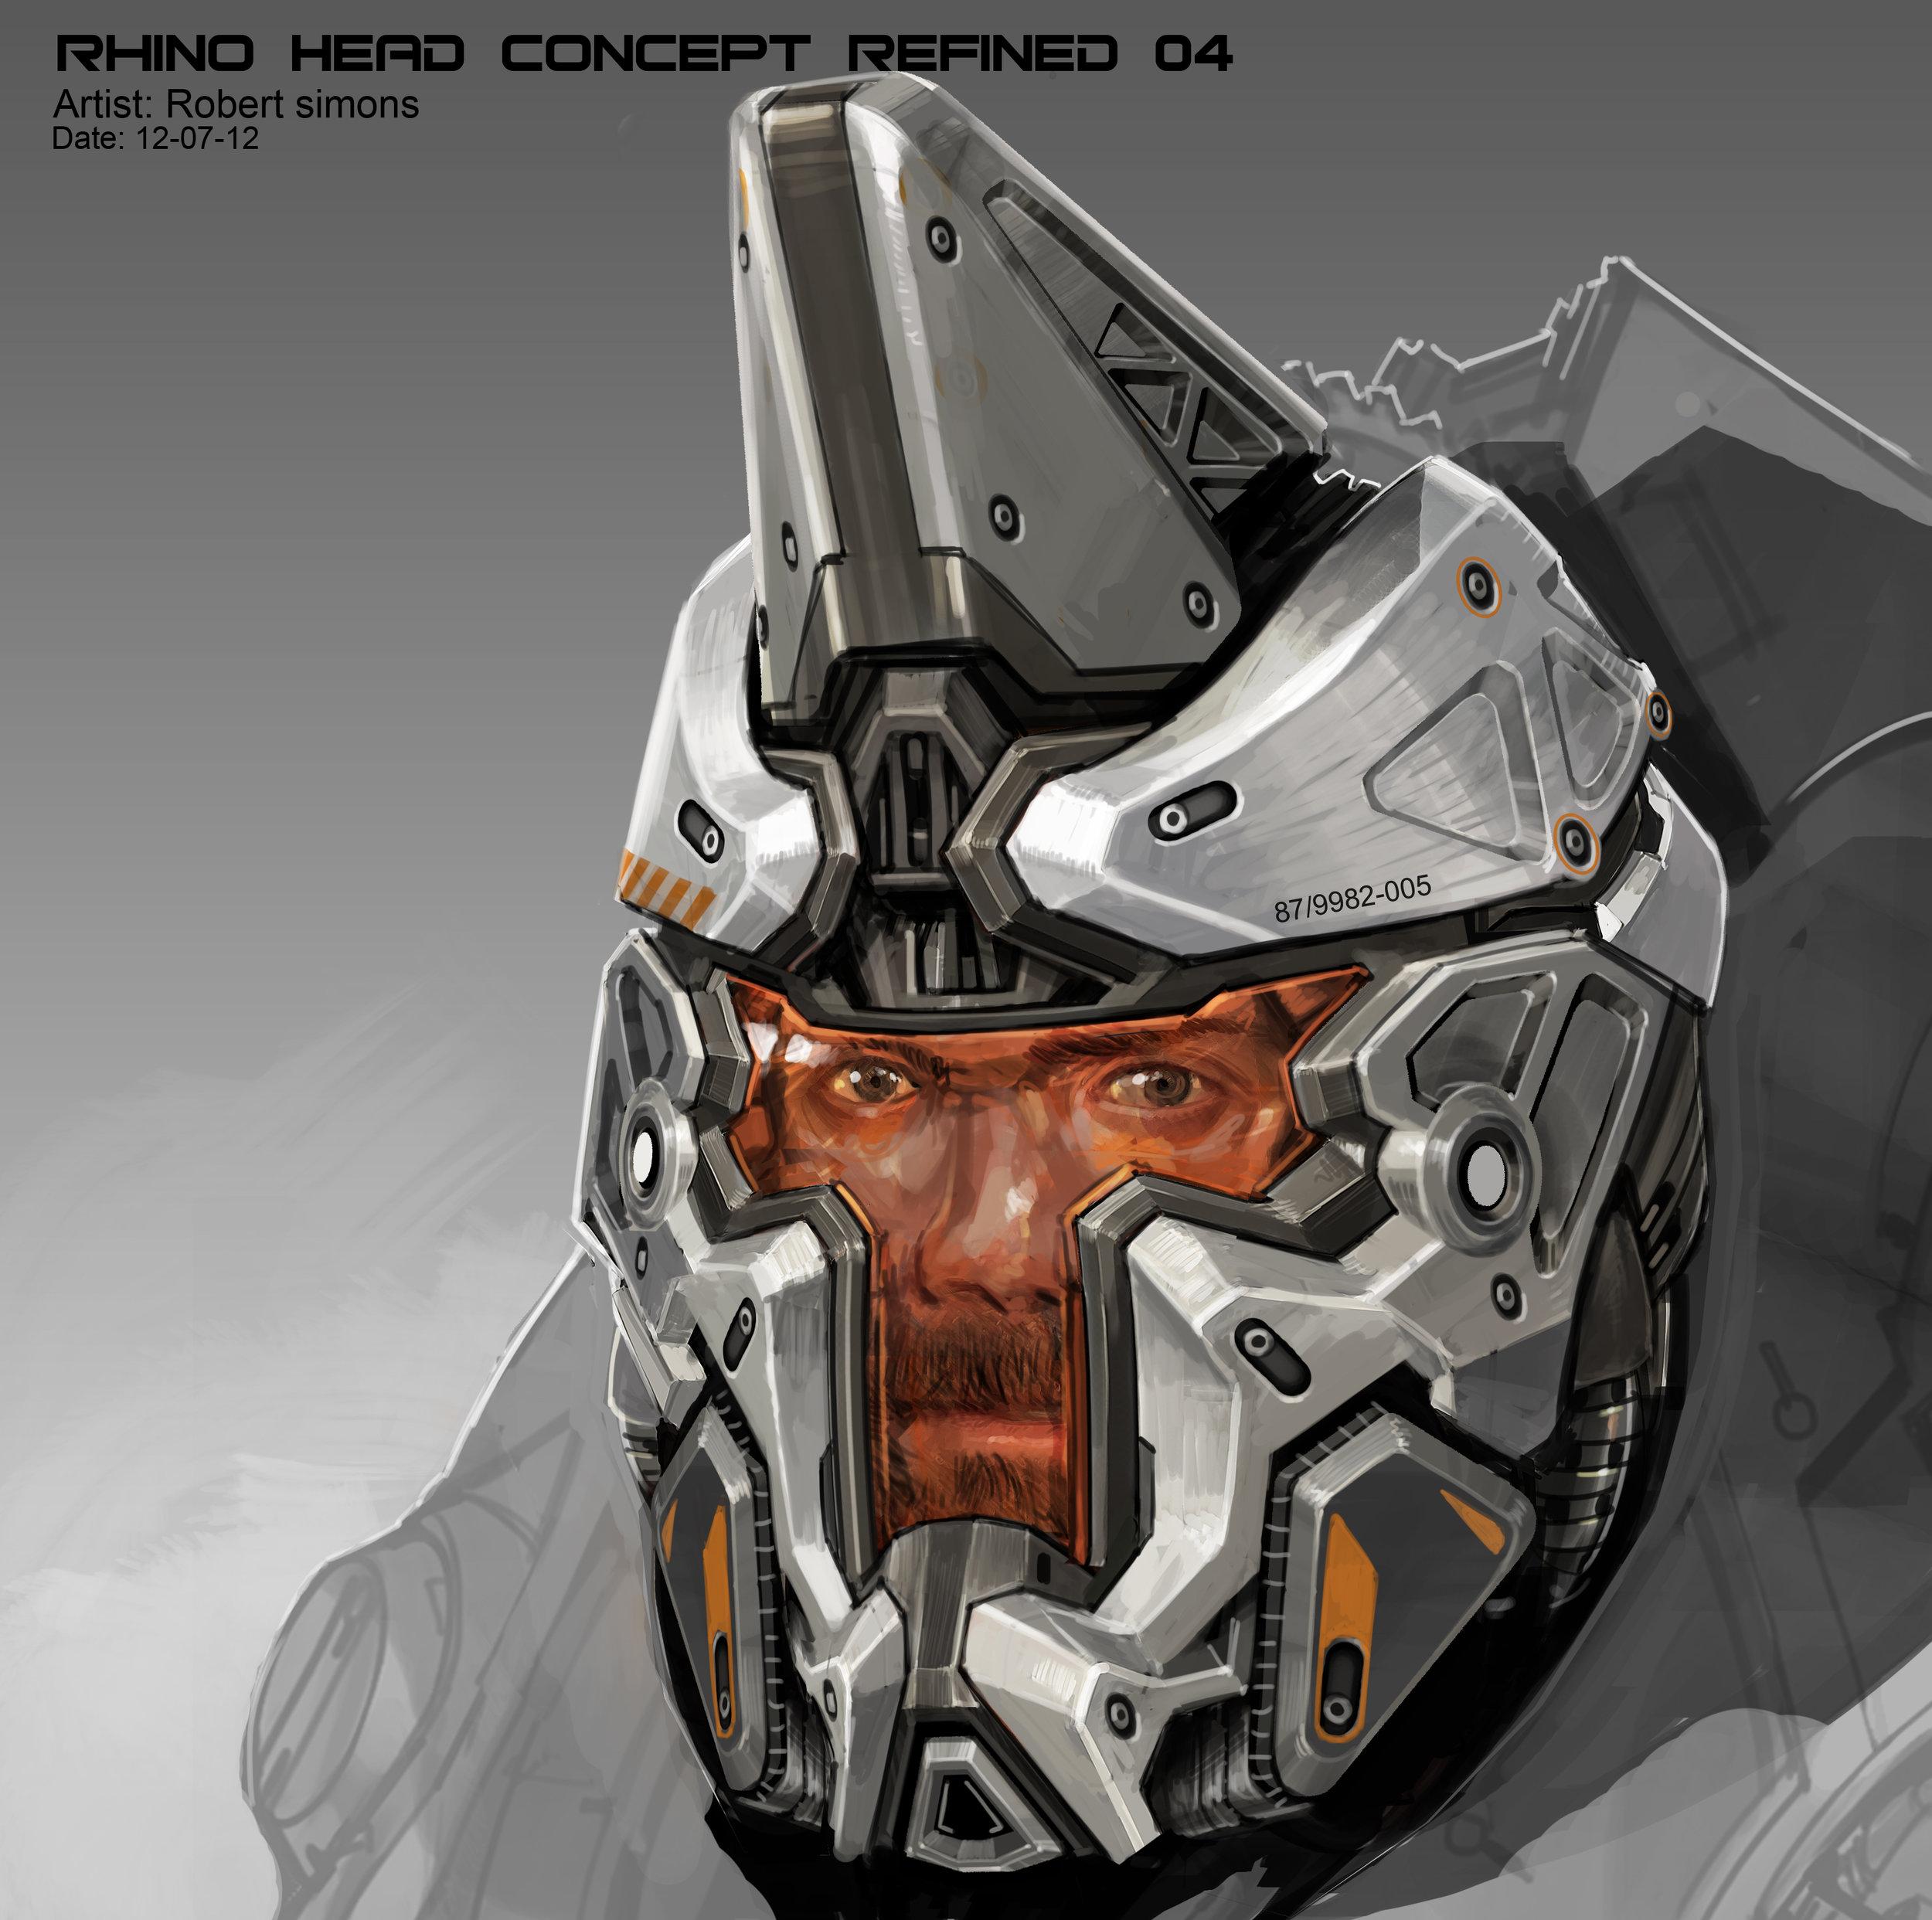 rhino_HeadConceptRefined04_120712_RS.jpg